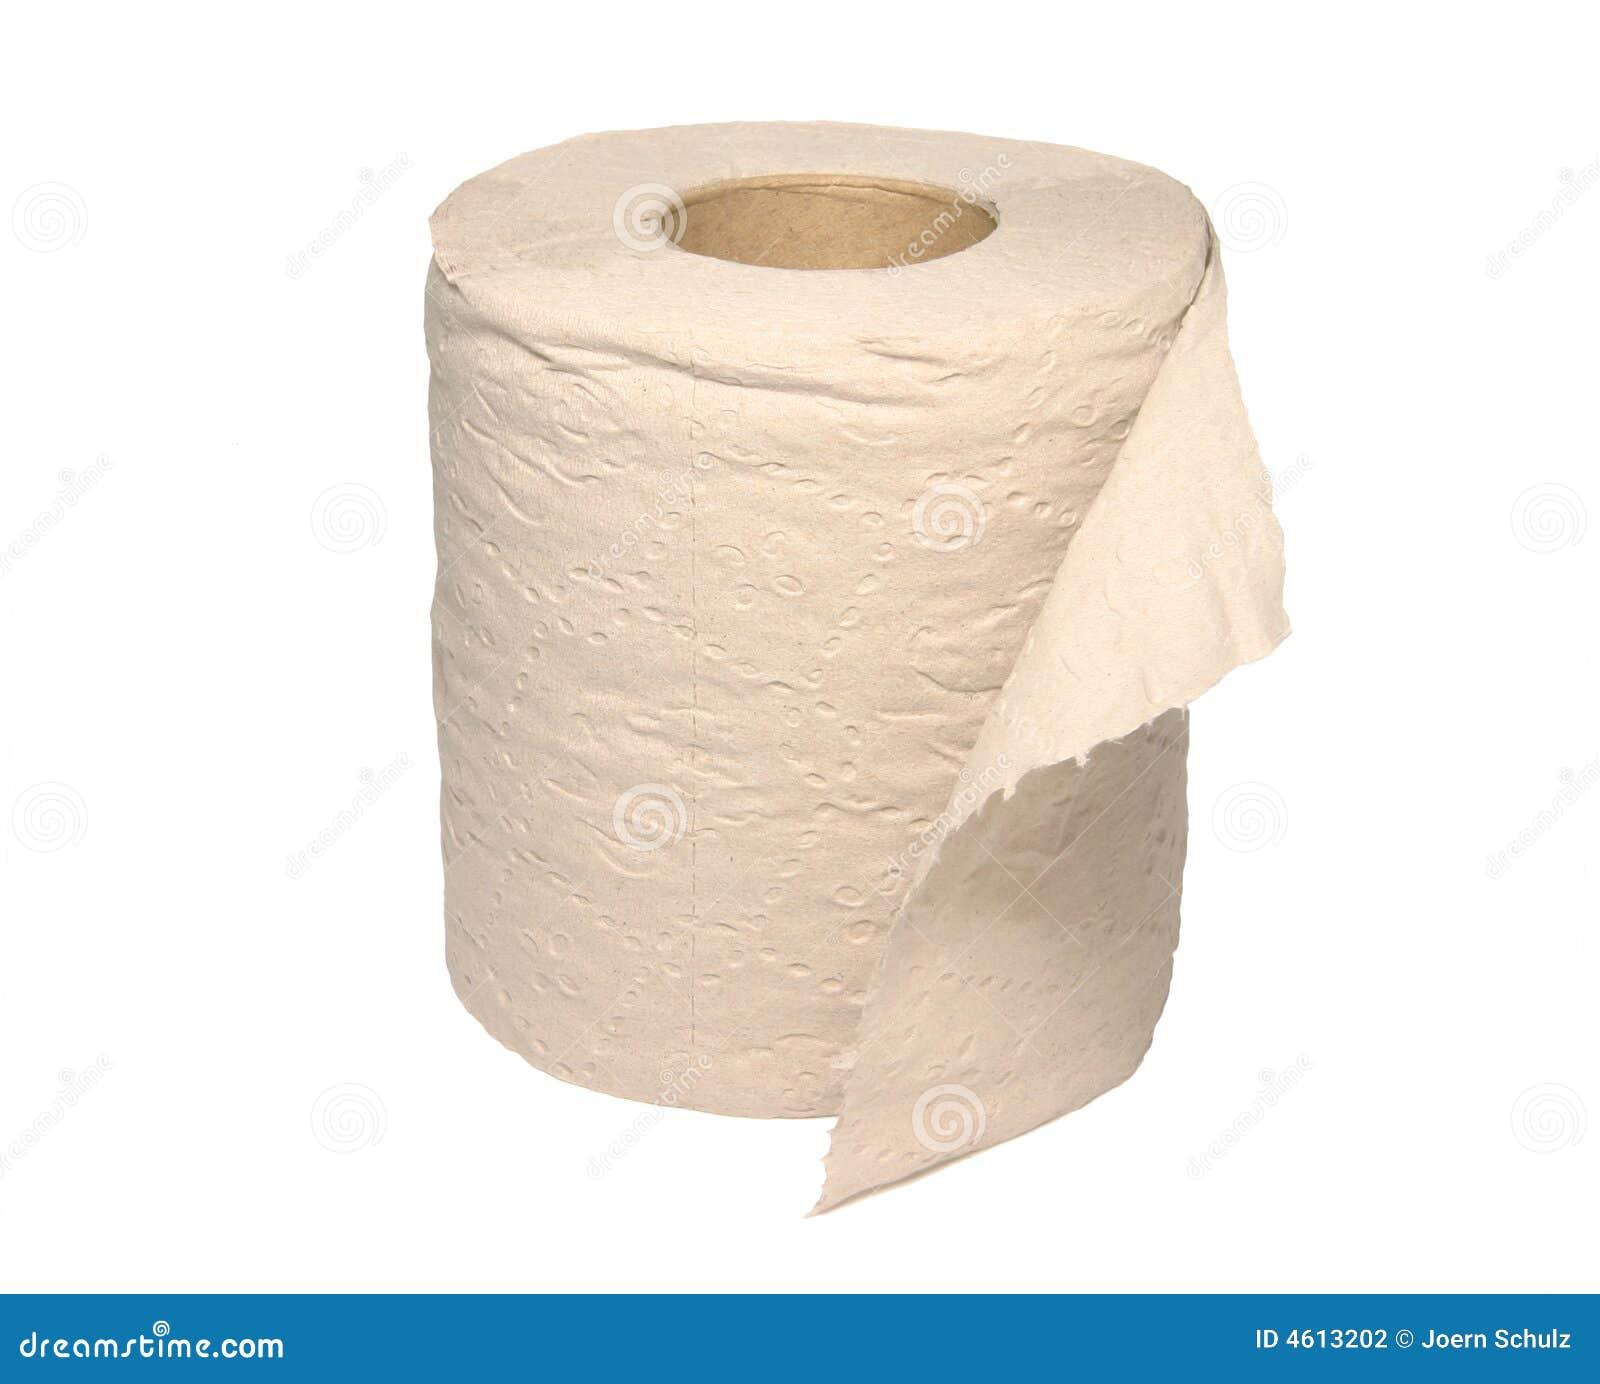 Carta igienica riciclata fotografia stock immagine 4613202 for Accesorios para bano papel higienico